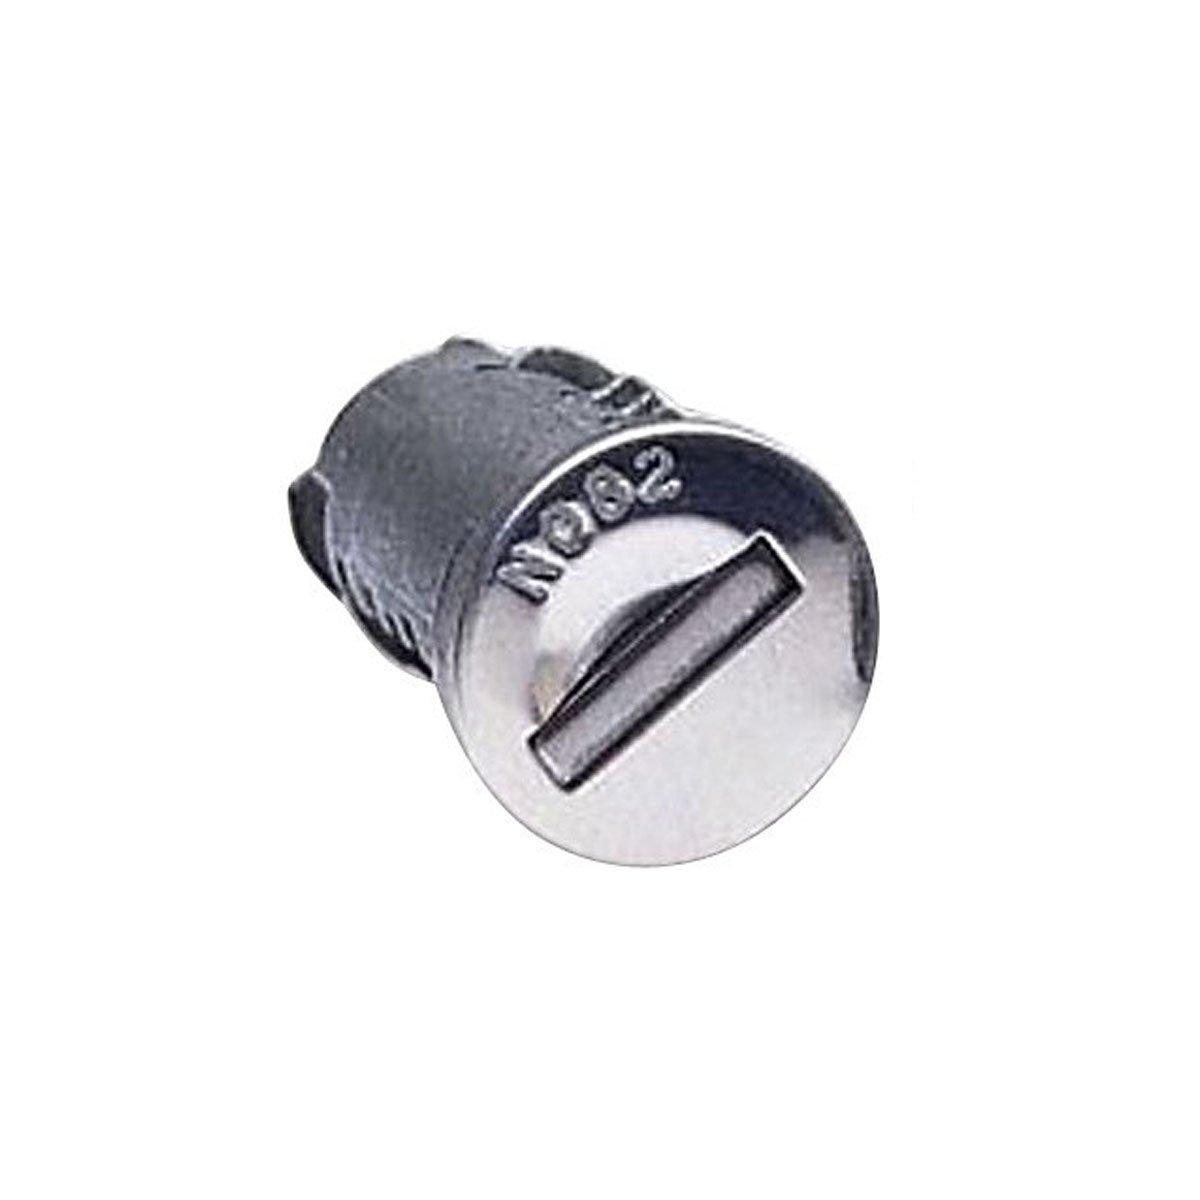 Thule Car Rack Replacement Lock Cylinders N076 Single